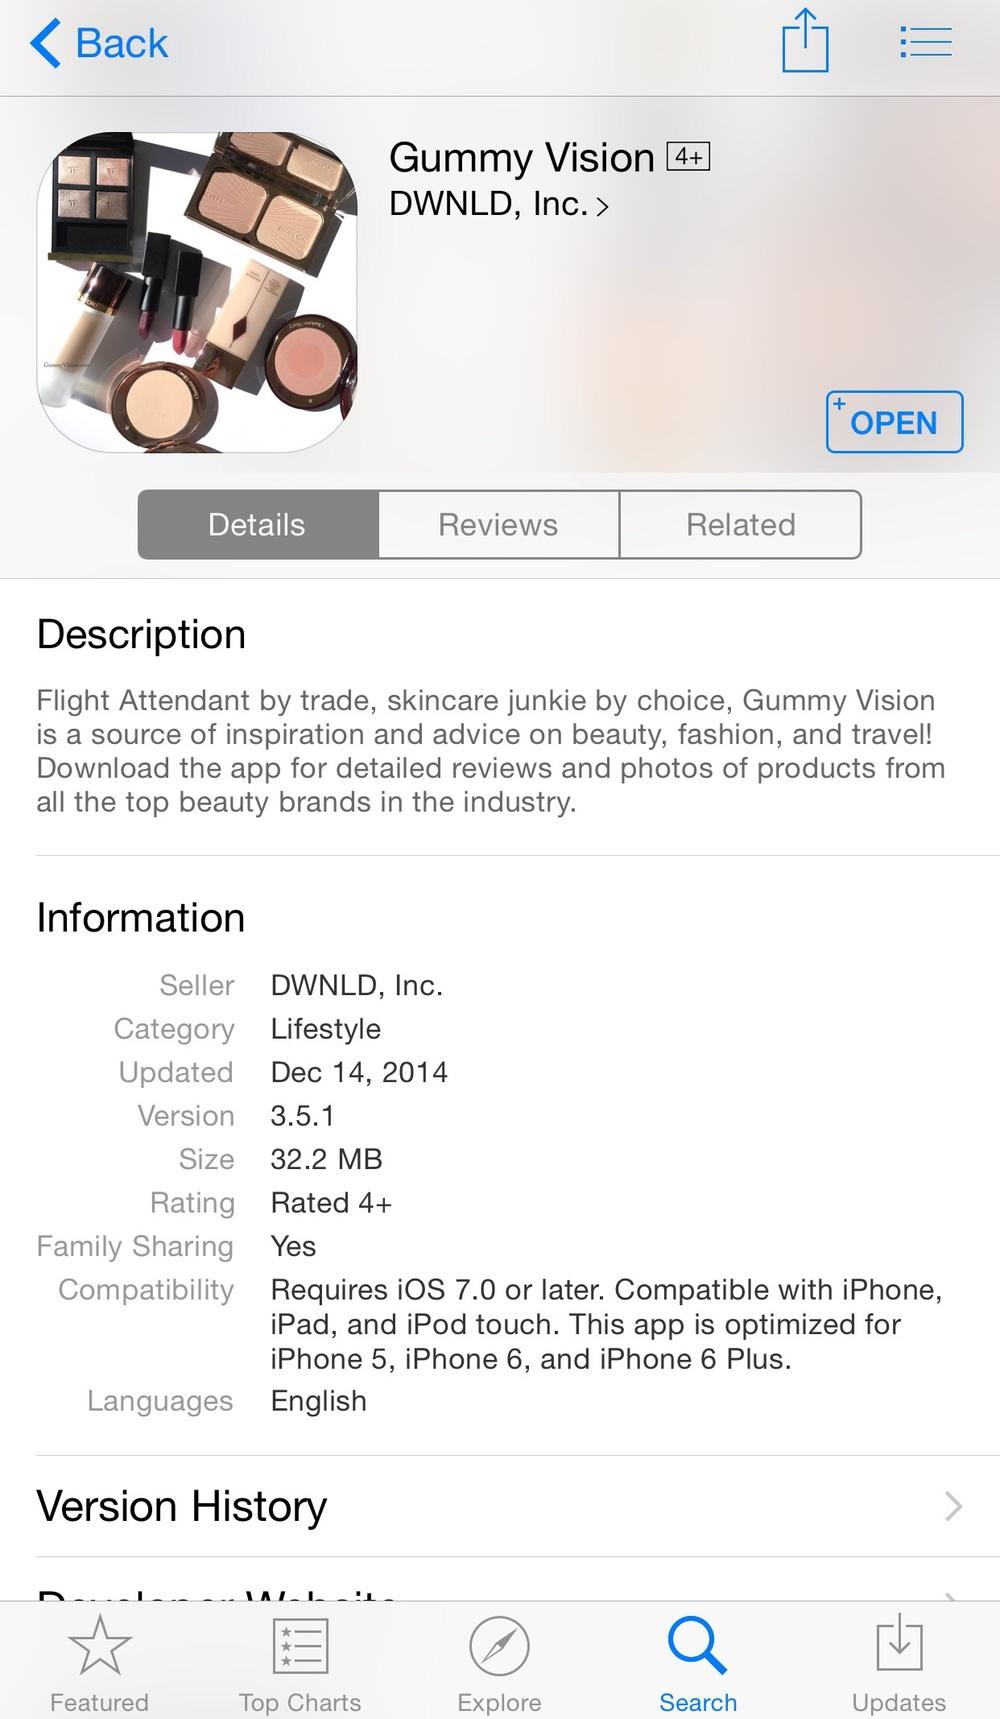 Gummy Vision app - www.gummyvision.com